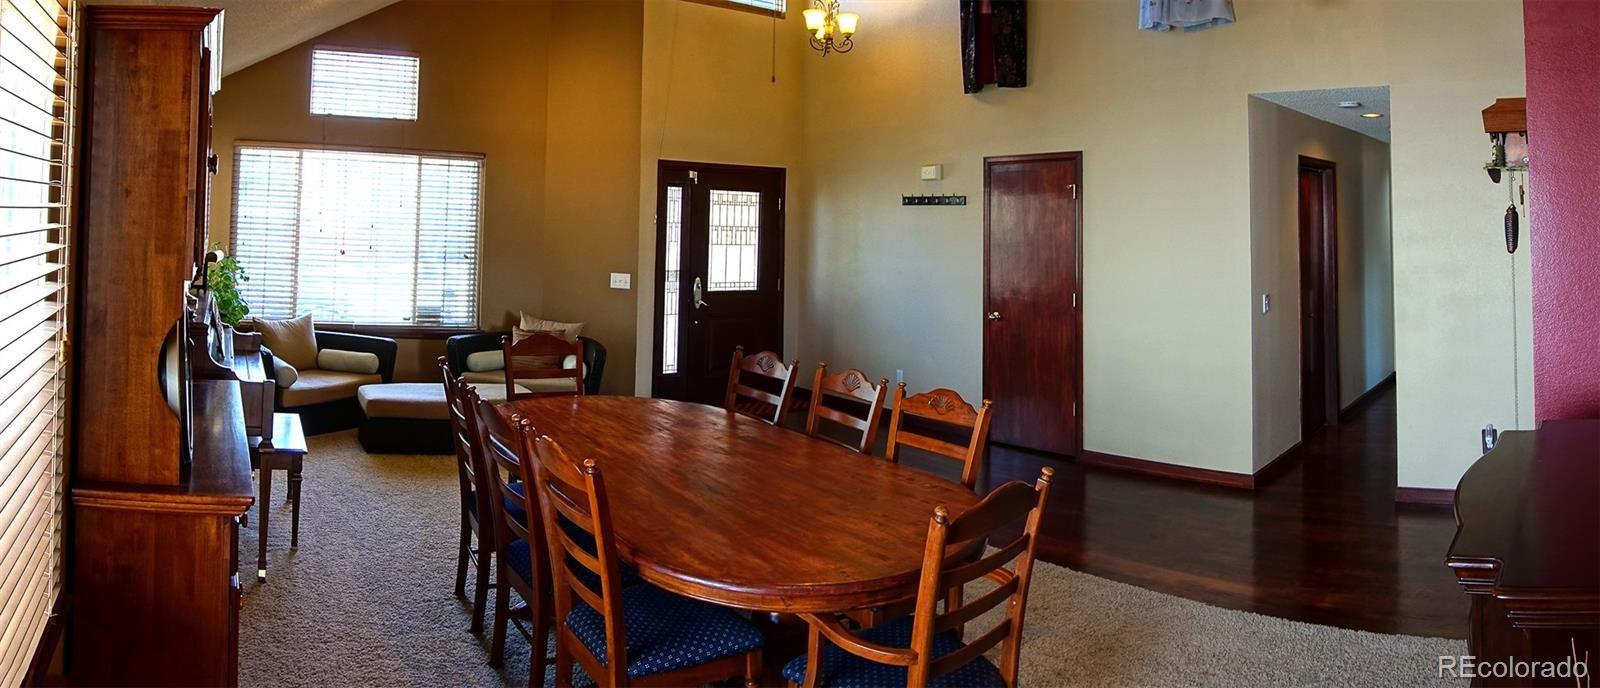 MLS# 3318398 - 8 - 4527 Buena Vista Court, Castle Rock, CO 80109